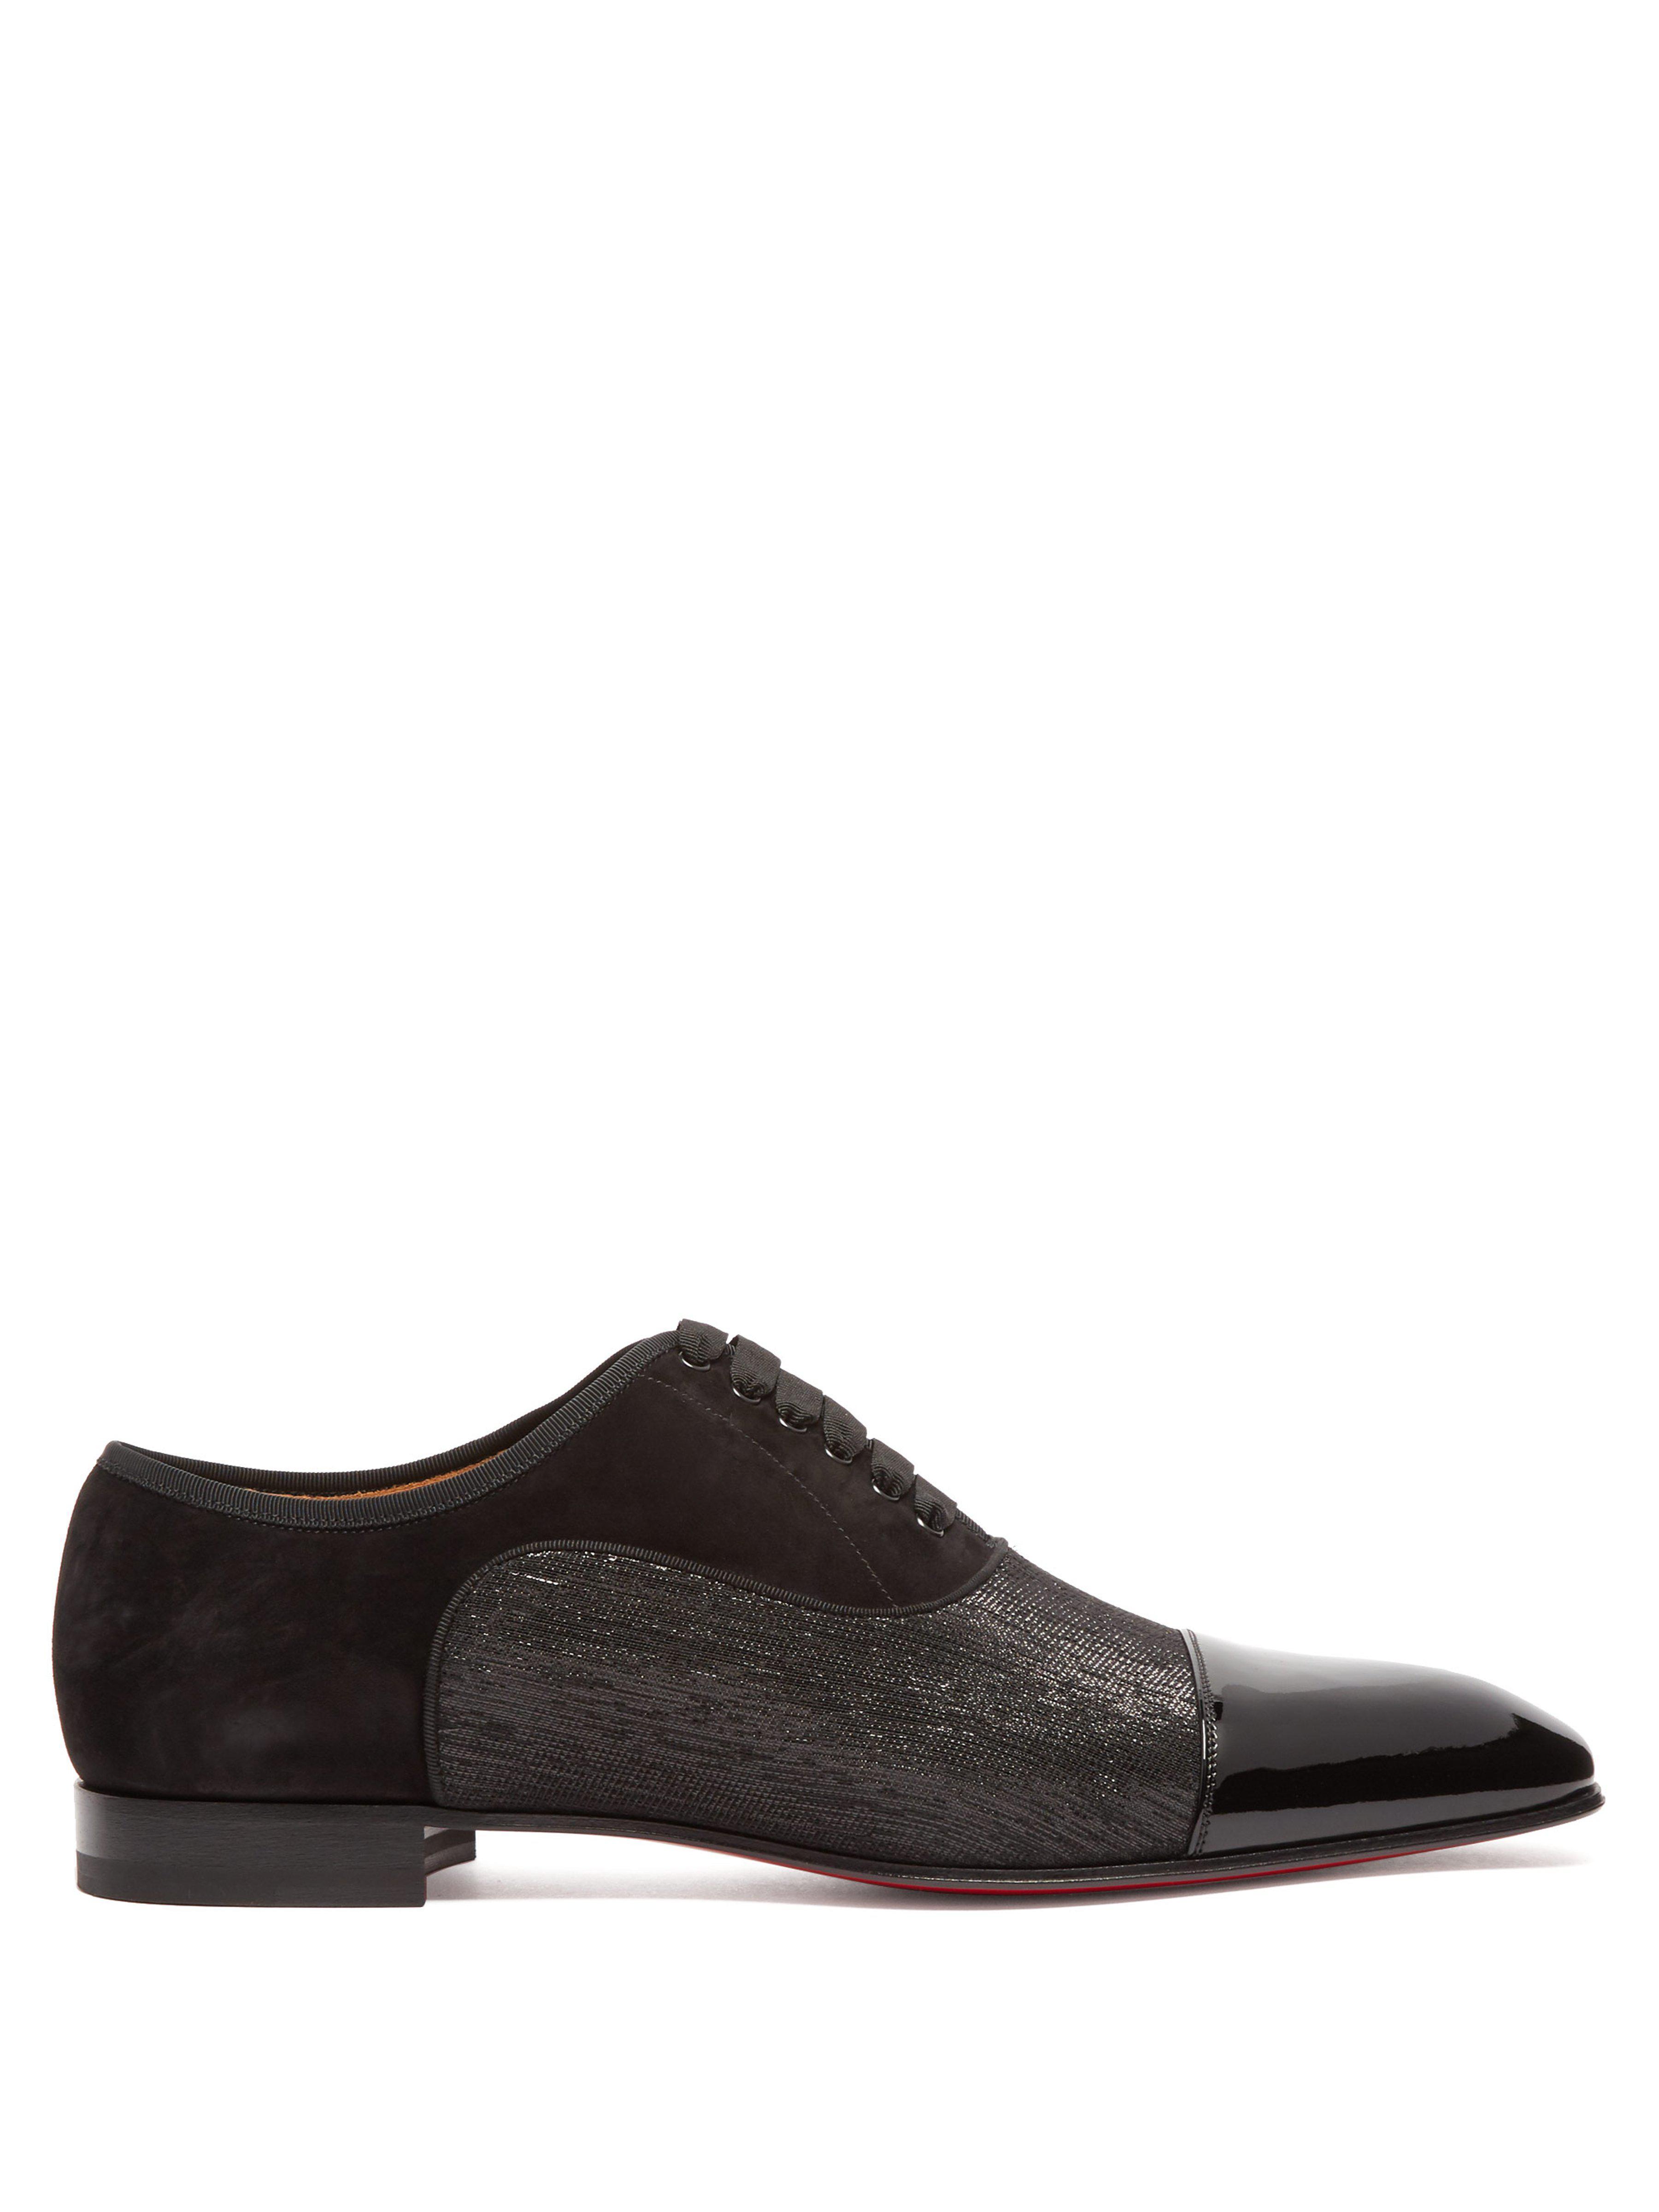 7e25e6befe3d Christian Louboutin Greggo Orlato Patent Leather Oxford Shoes in ...